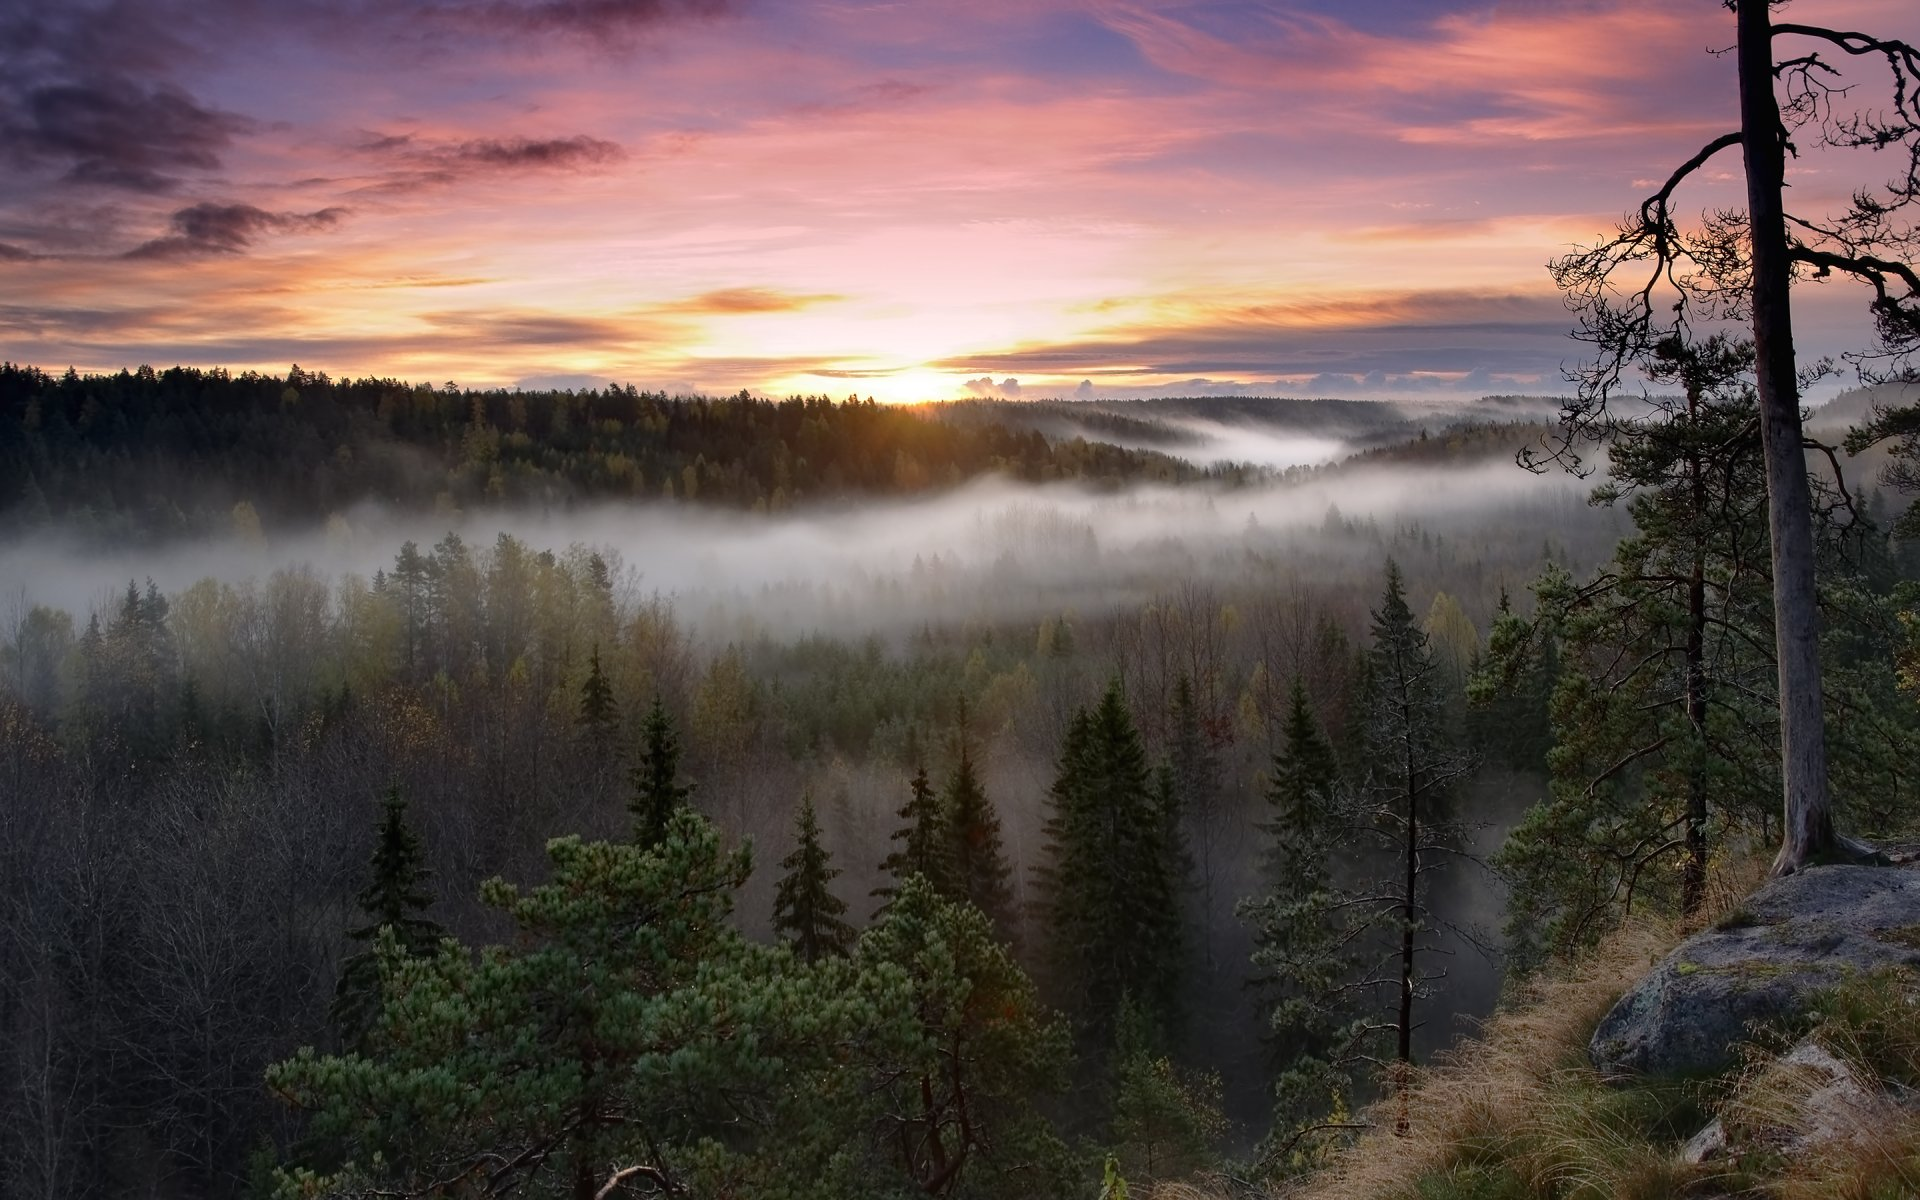 Обои месяц, финляндия. Природа foto 11